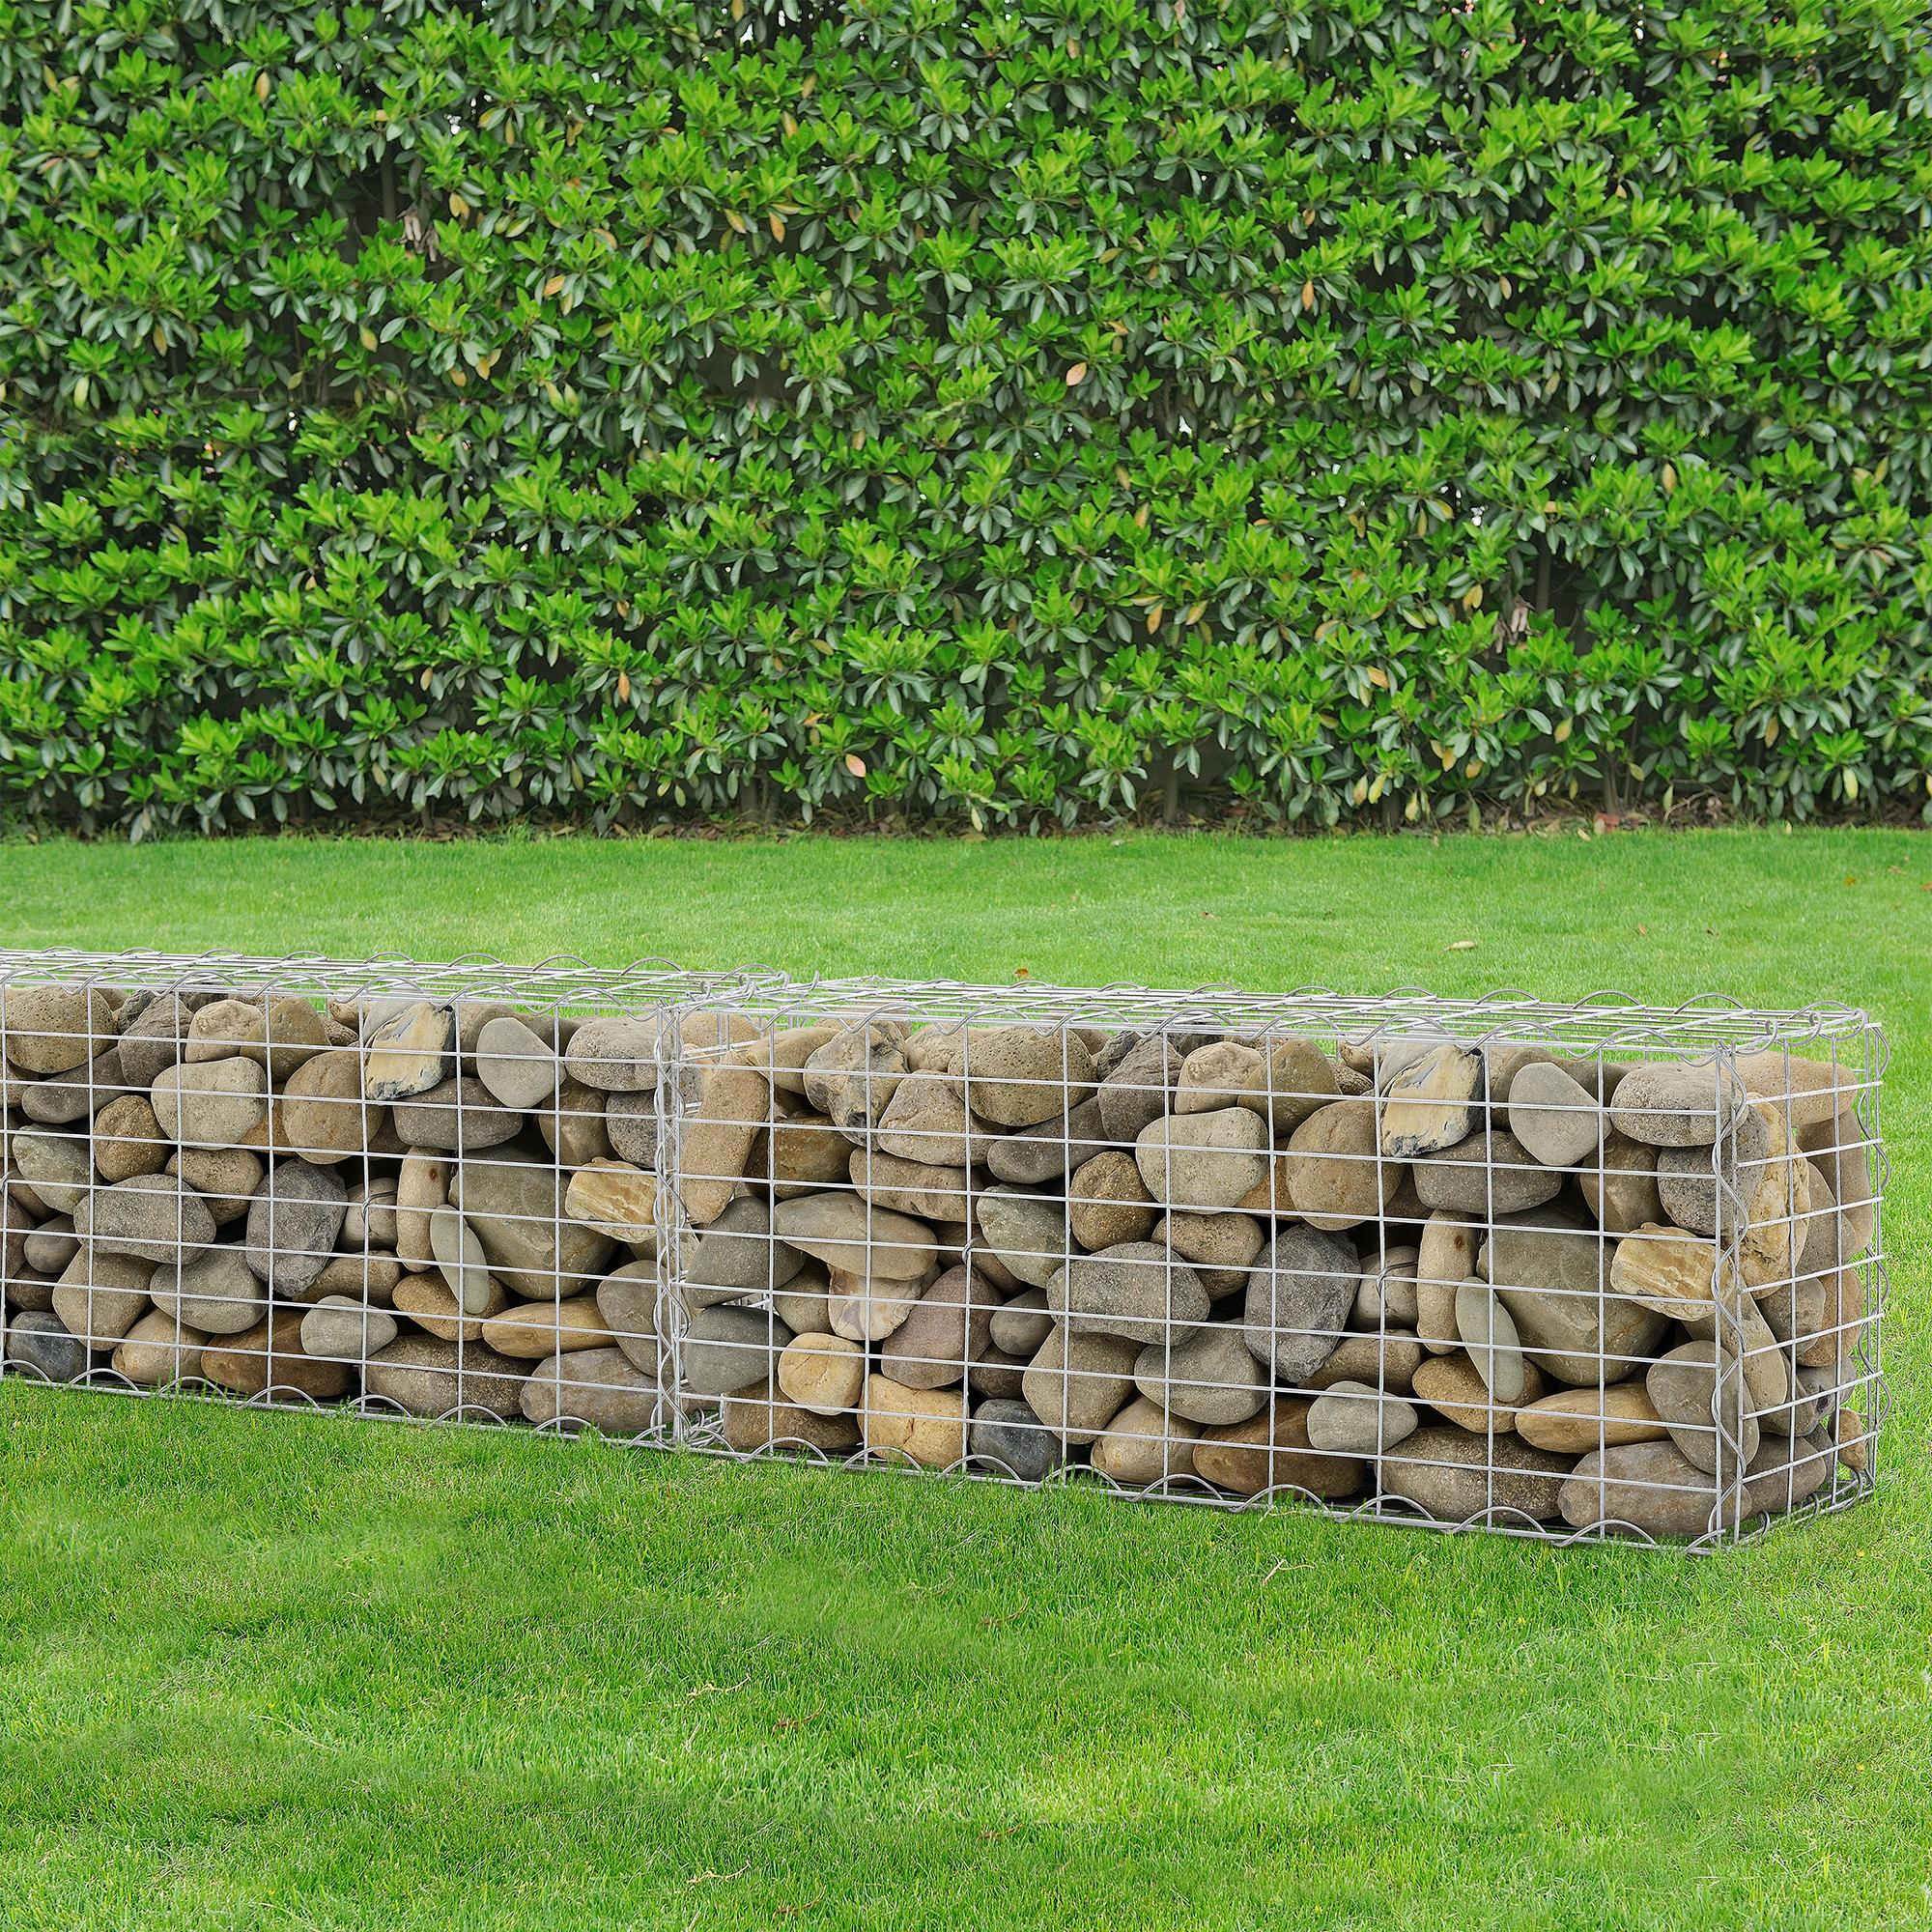 gabion 100x40x30 cm stone basket wall wire bench ebay. Black Bedroom Furniture Sets. Home Design Ideas